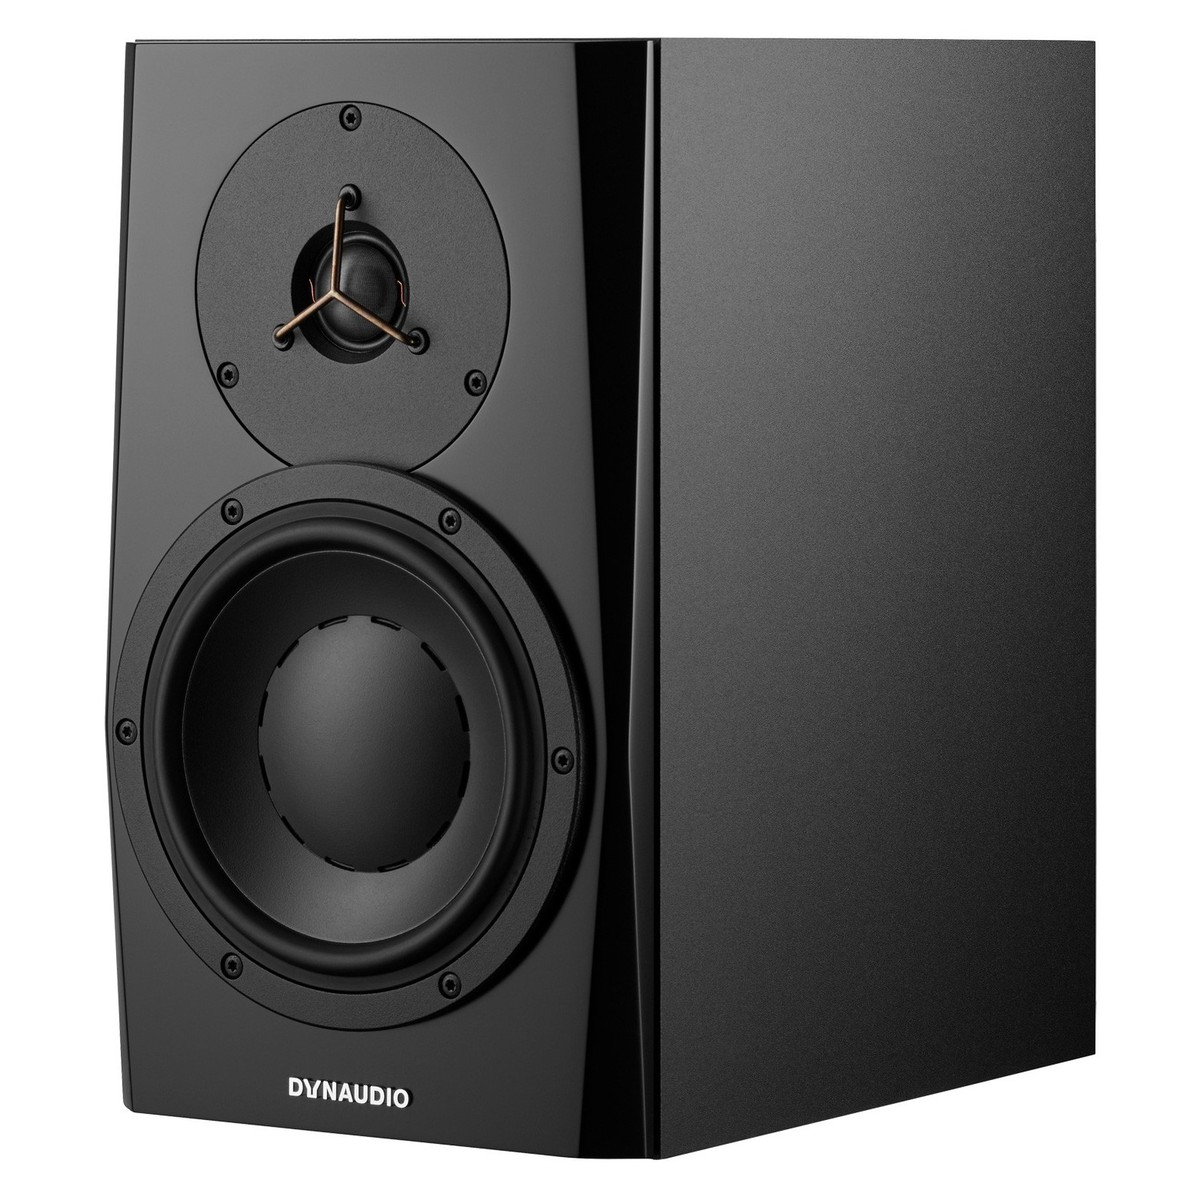 dynaudio lyd 7 near field studio monitor black at gear4music. Black Bedroom Furniture Sets. Home Design Ideas